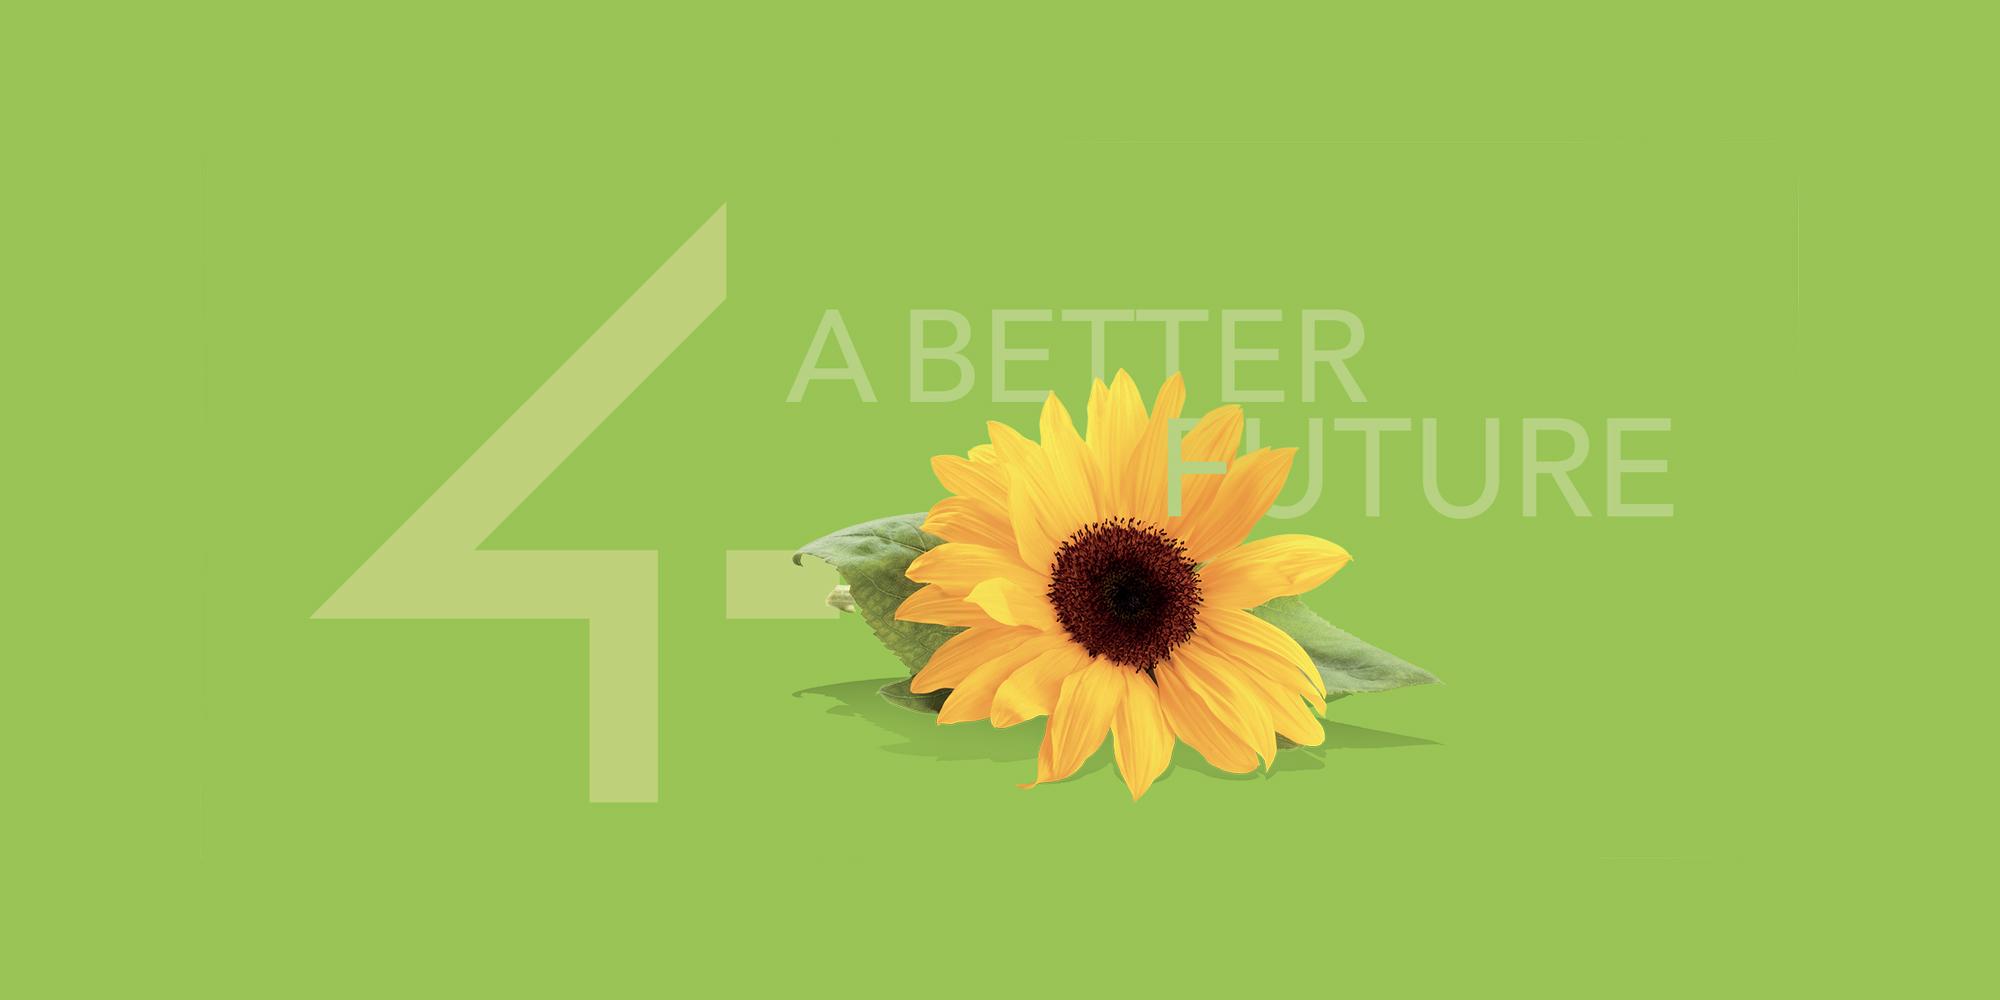 4 A Better Future